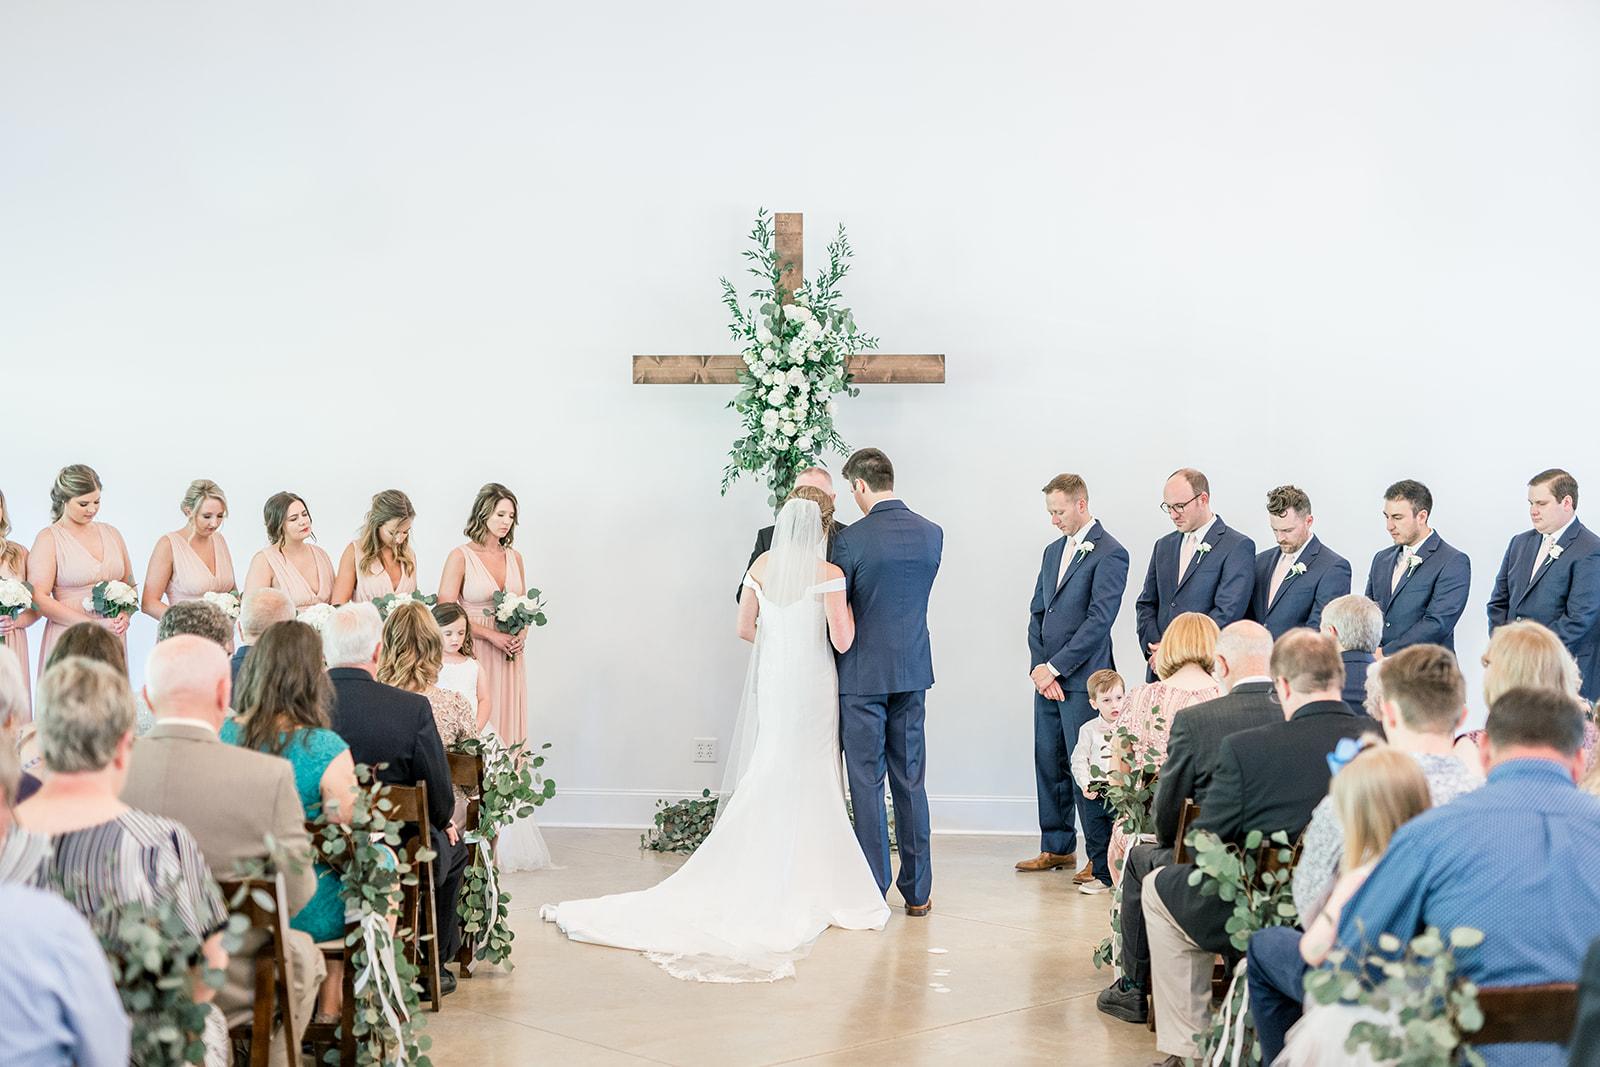 blush_wedding_at_white_oak_farms_medina_tn-09669.jpg